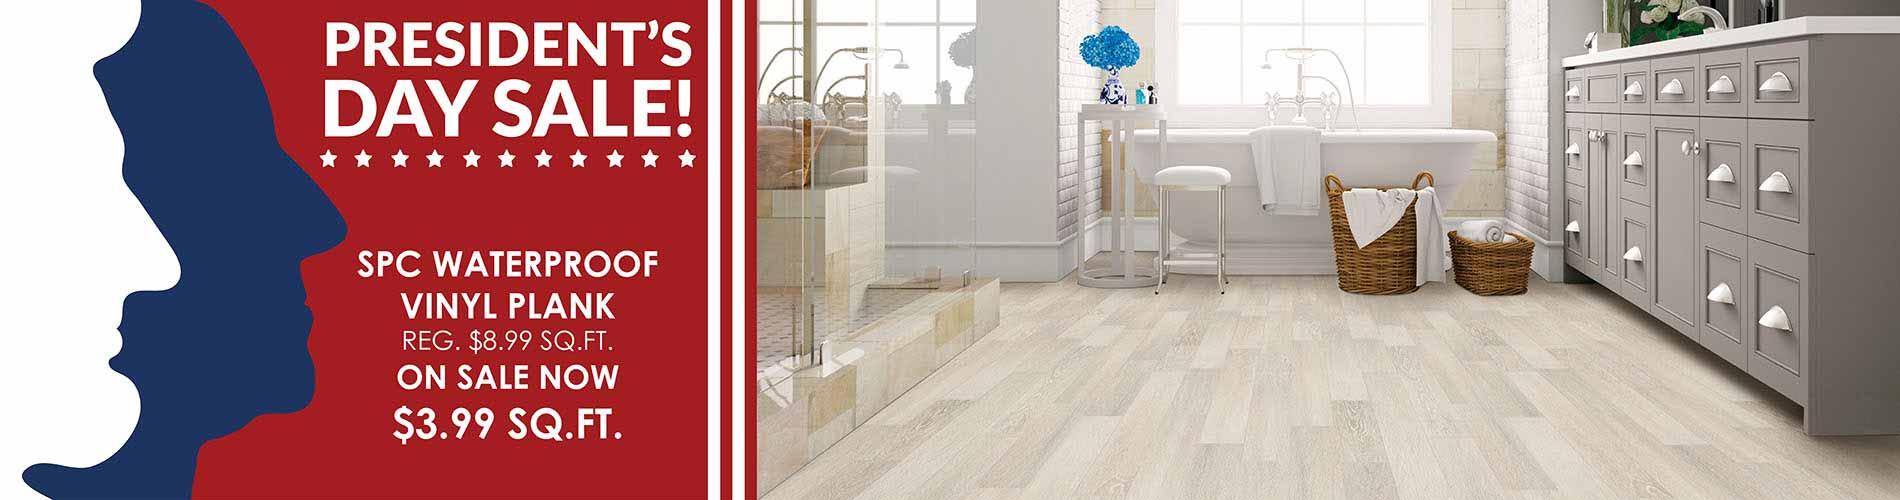 Save on SPC Waterproof Vinyl Plank Flooring during our Presidents Day Sale at Fine Floorz